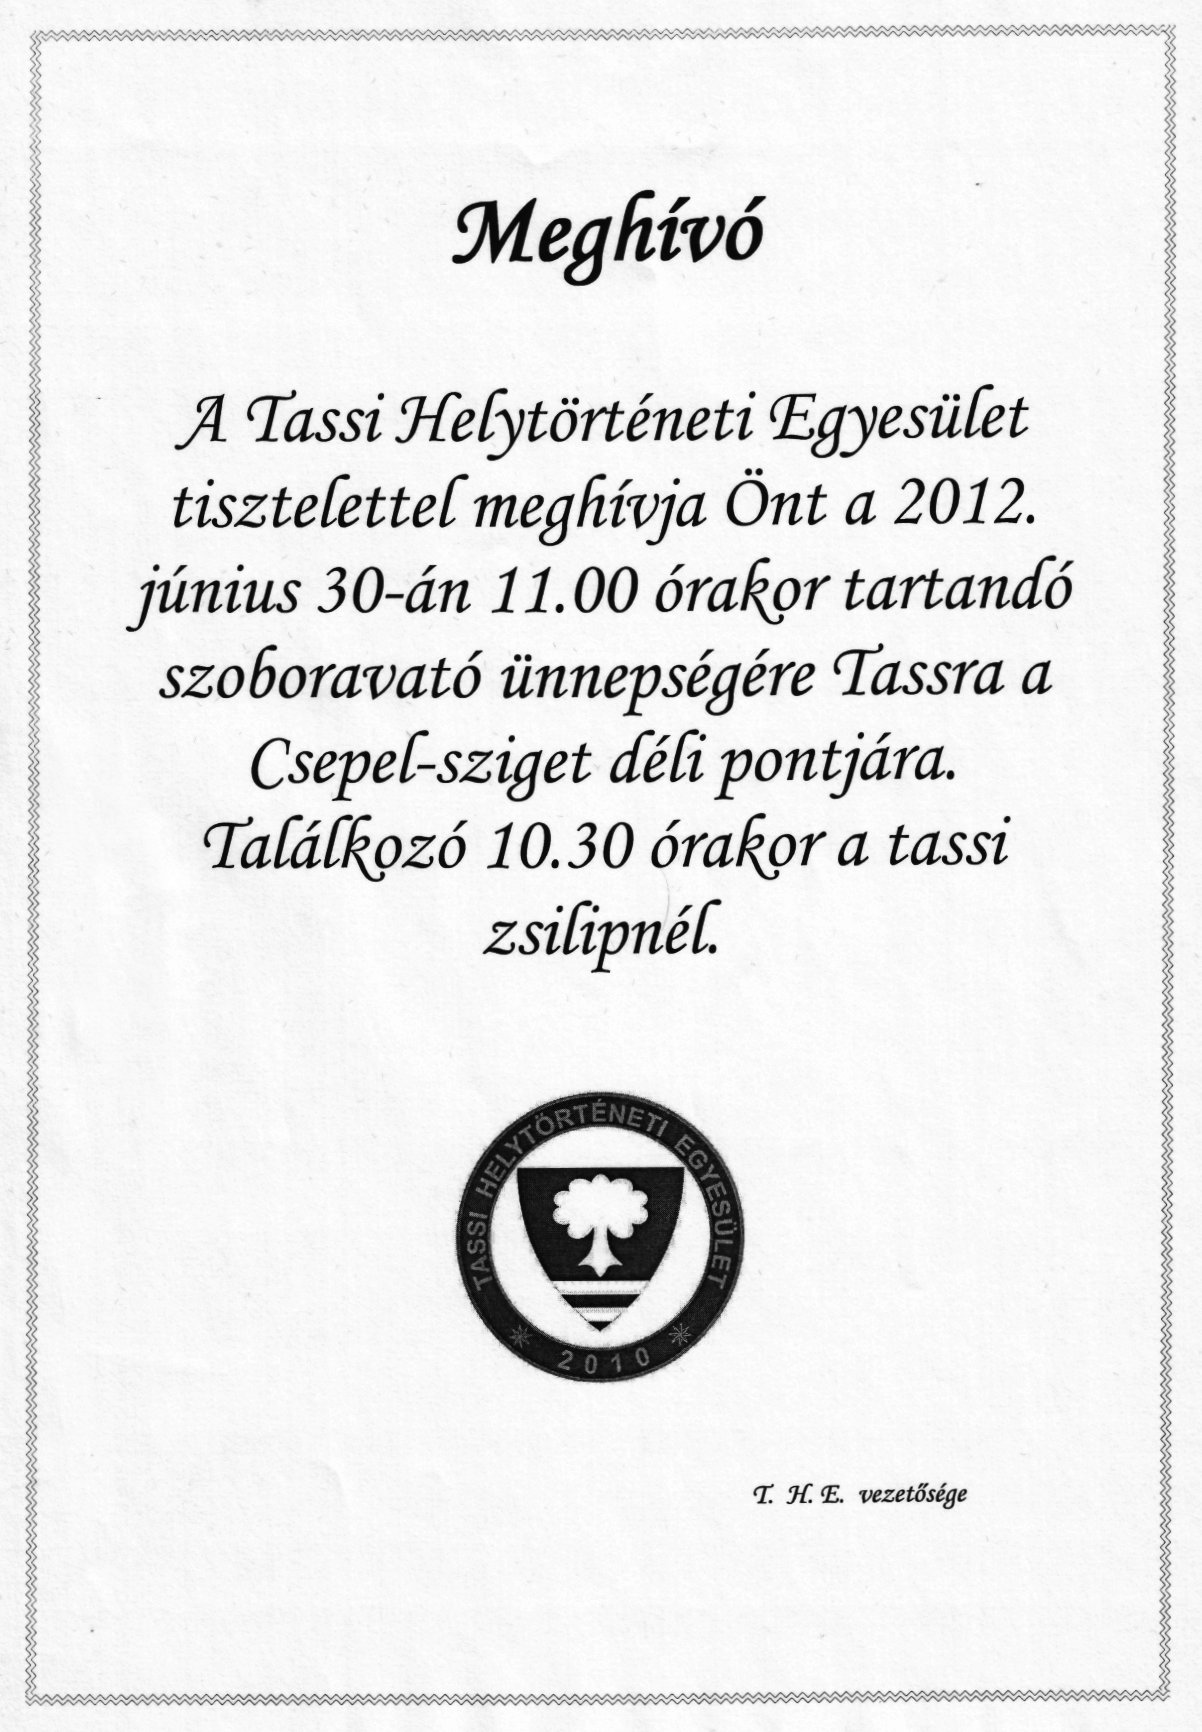 http://www.kisdunainagyhajok.hu/hirek/tassi-szoboravato-csepel-sziget-deli-pontjan/tassi-szoboravato-csepel-sziget-deli-pontjan_001.jpg